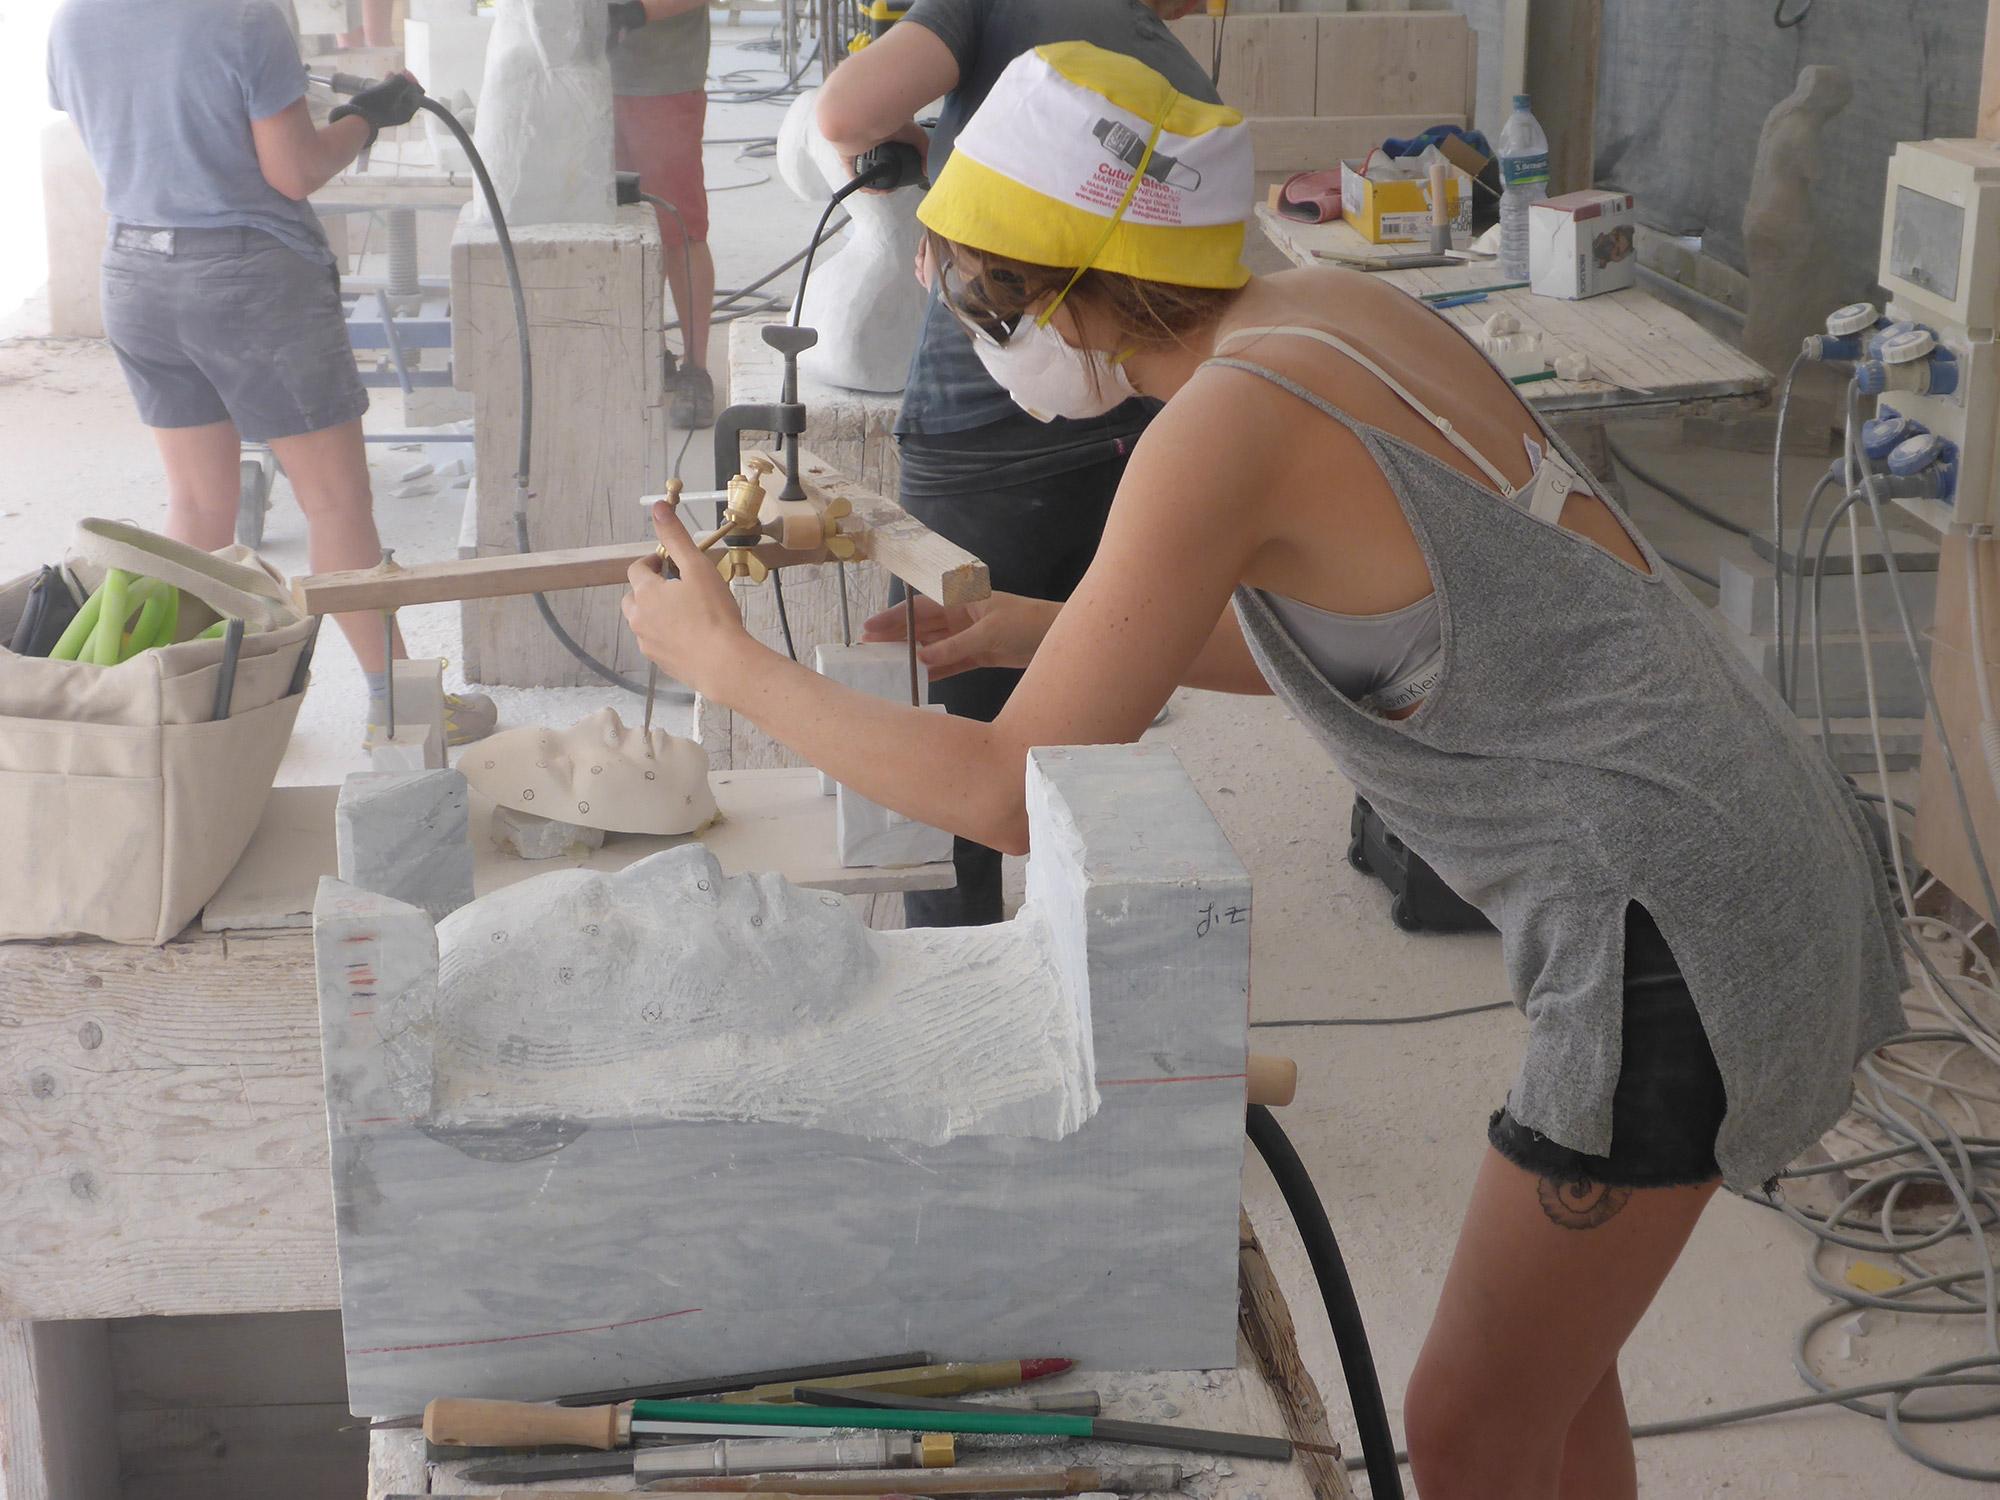 Mary-Beth-Gutkowski-Sculpture-Residency-Amelia-Kate-Sampson-and-Elizabeth-Hardy20171213_0207.jpg